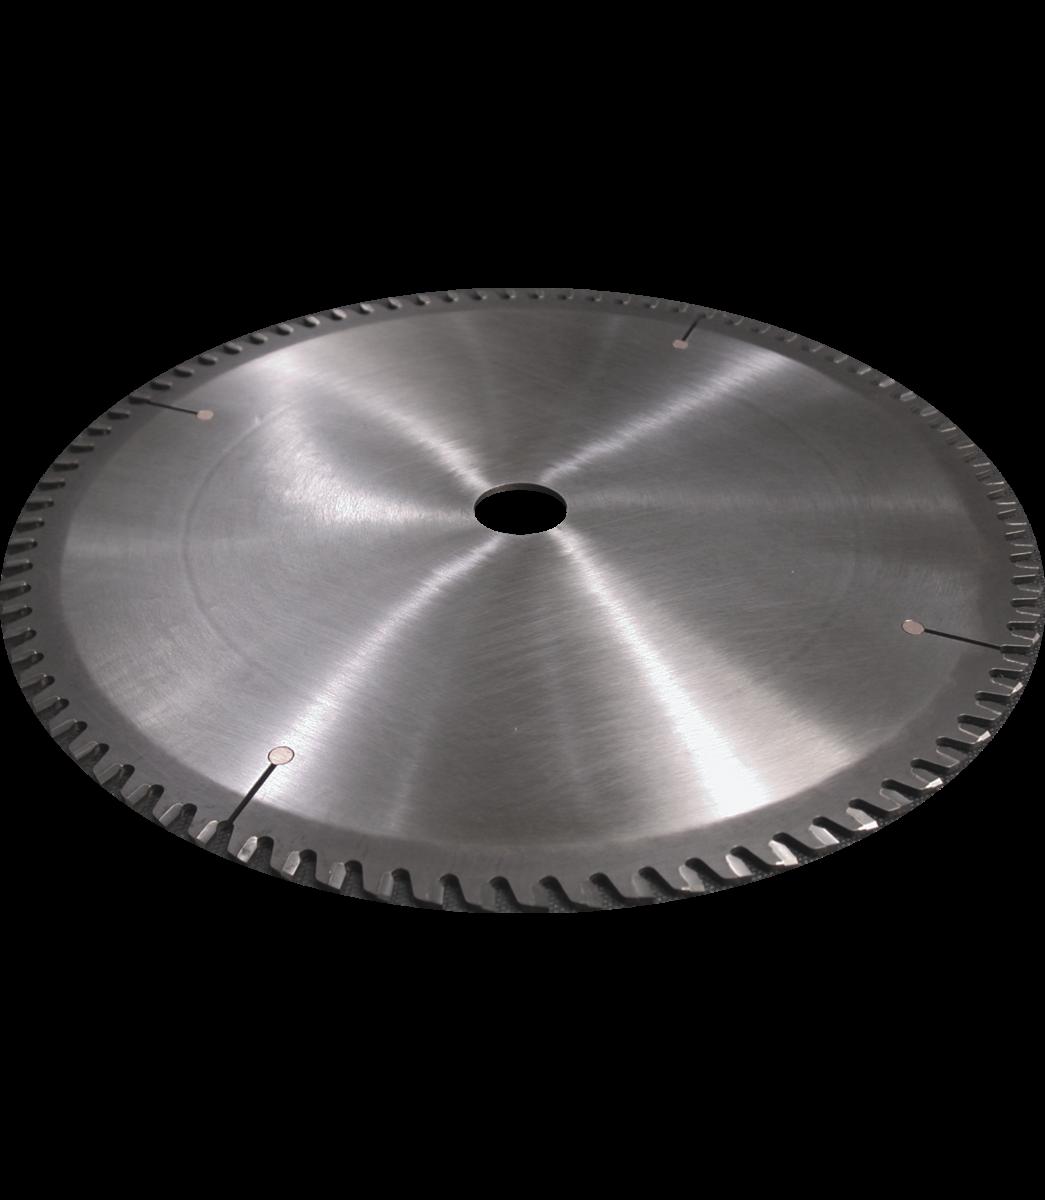 Ferrous Circular Saw Blade 350mm x 32mm x 2.5mm x 360T For J-FK350-2/4K